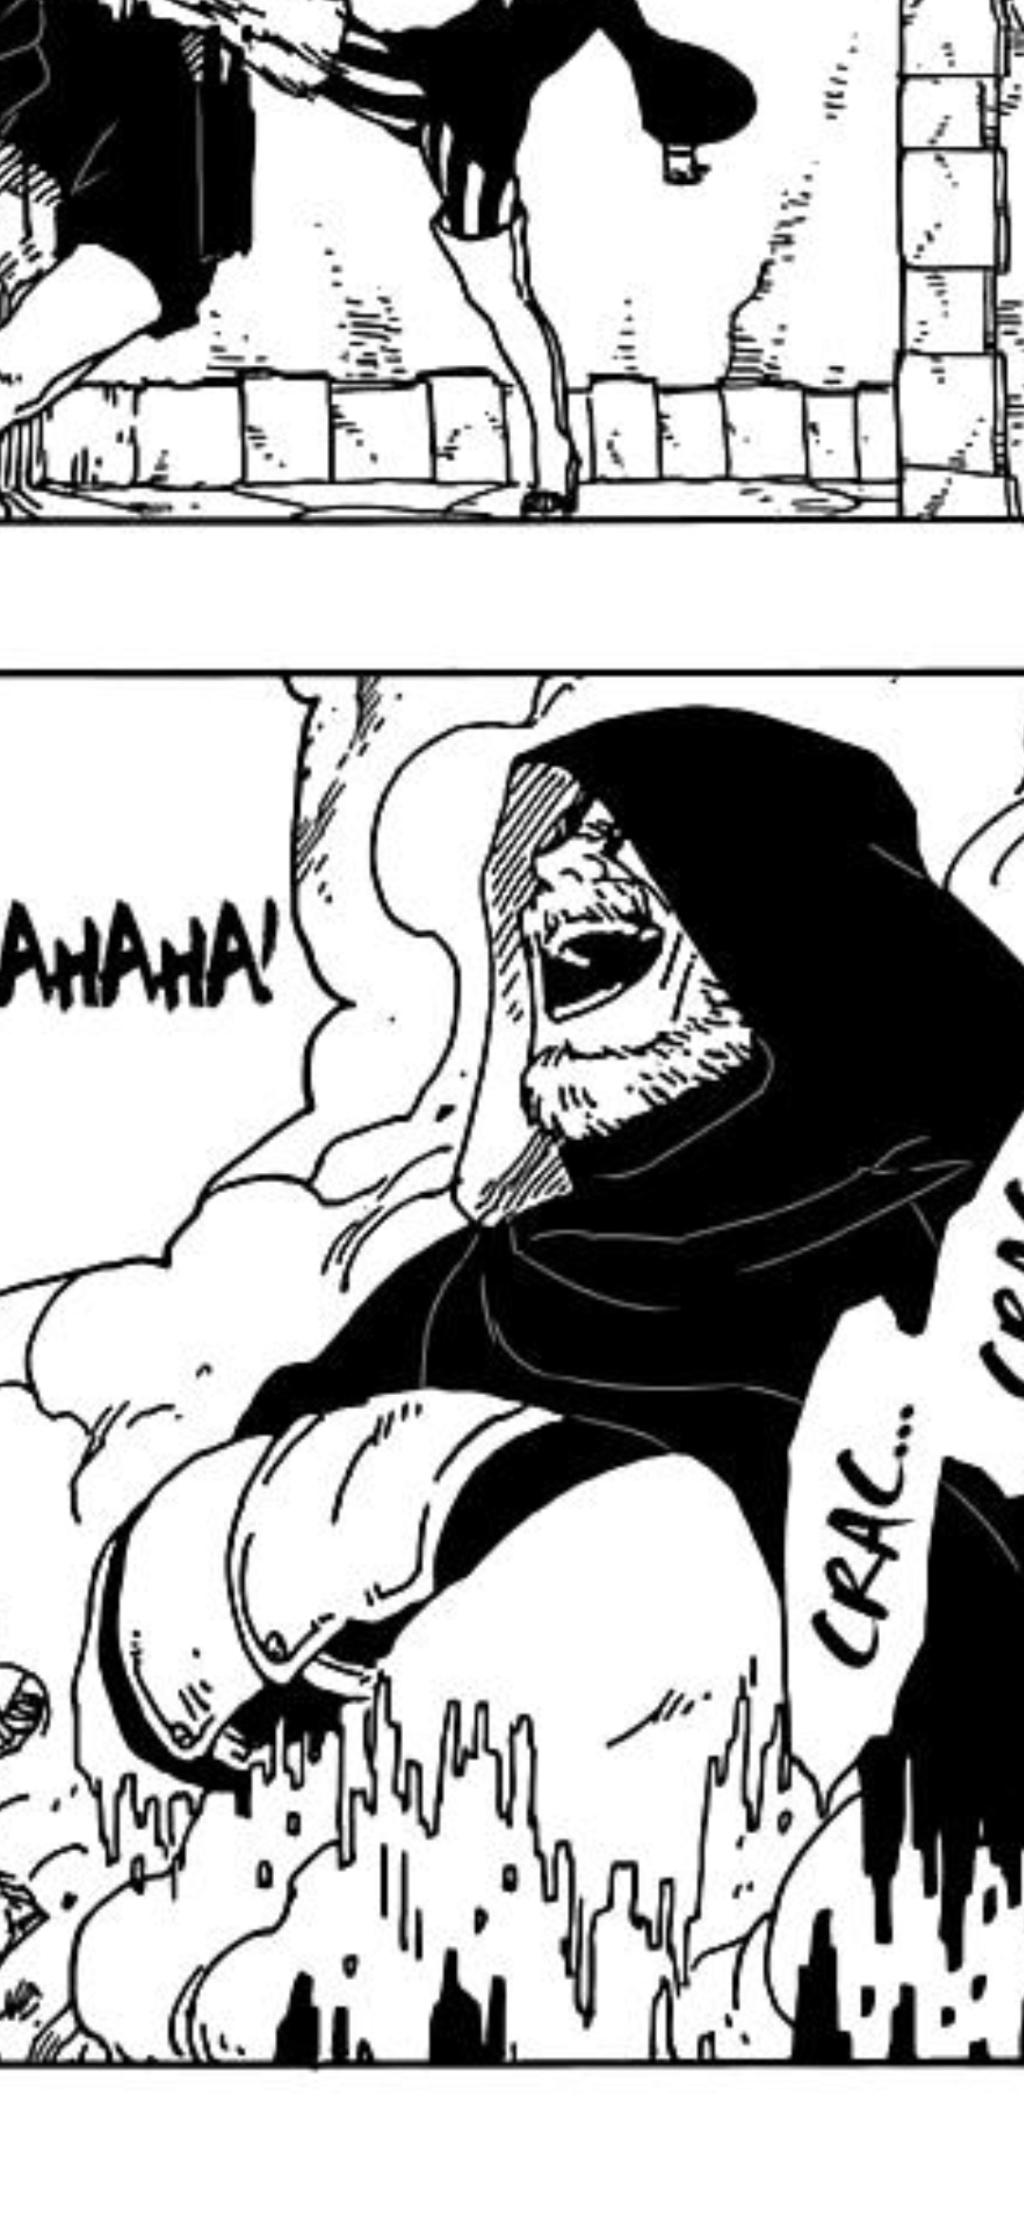 Time 7 + Kawaki vs  Tsunade  - Página 2 Scree126